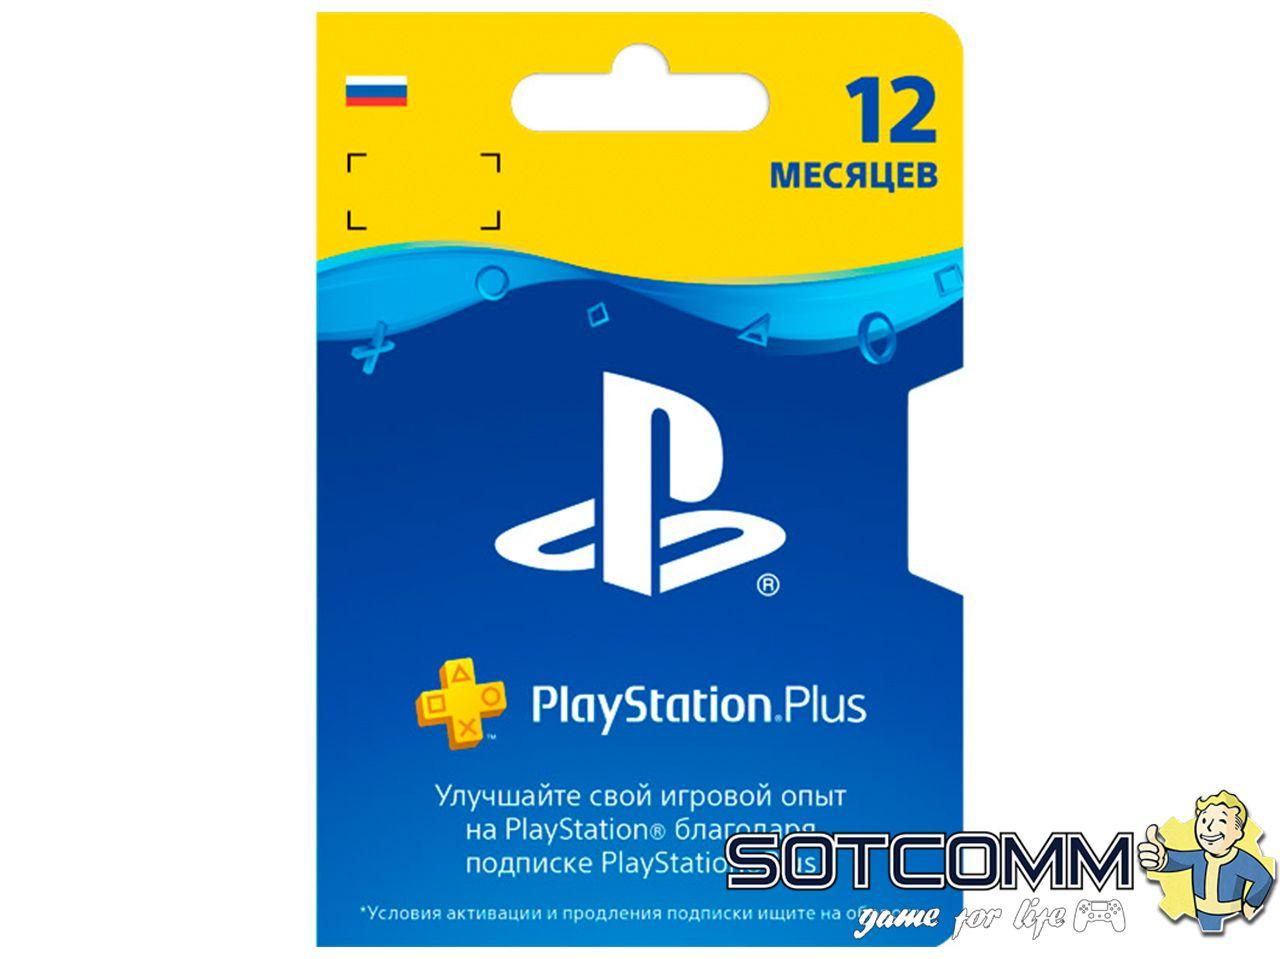 Подписка PlayStation Plus 12 месяцев